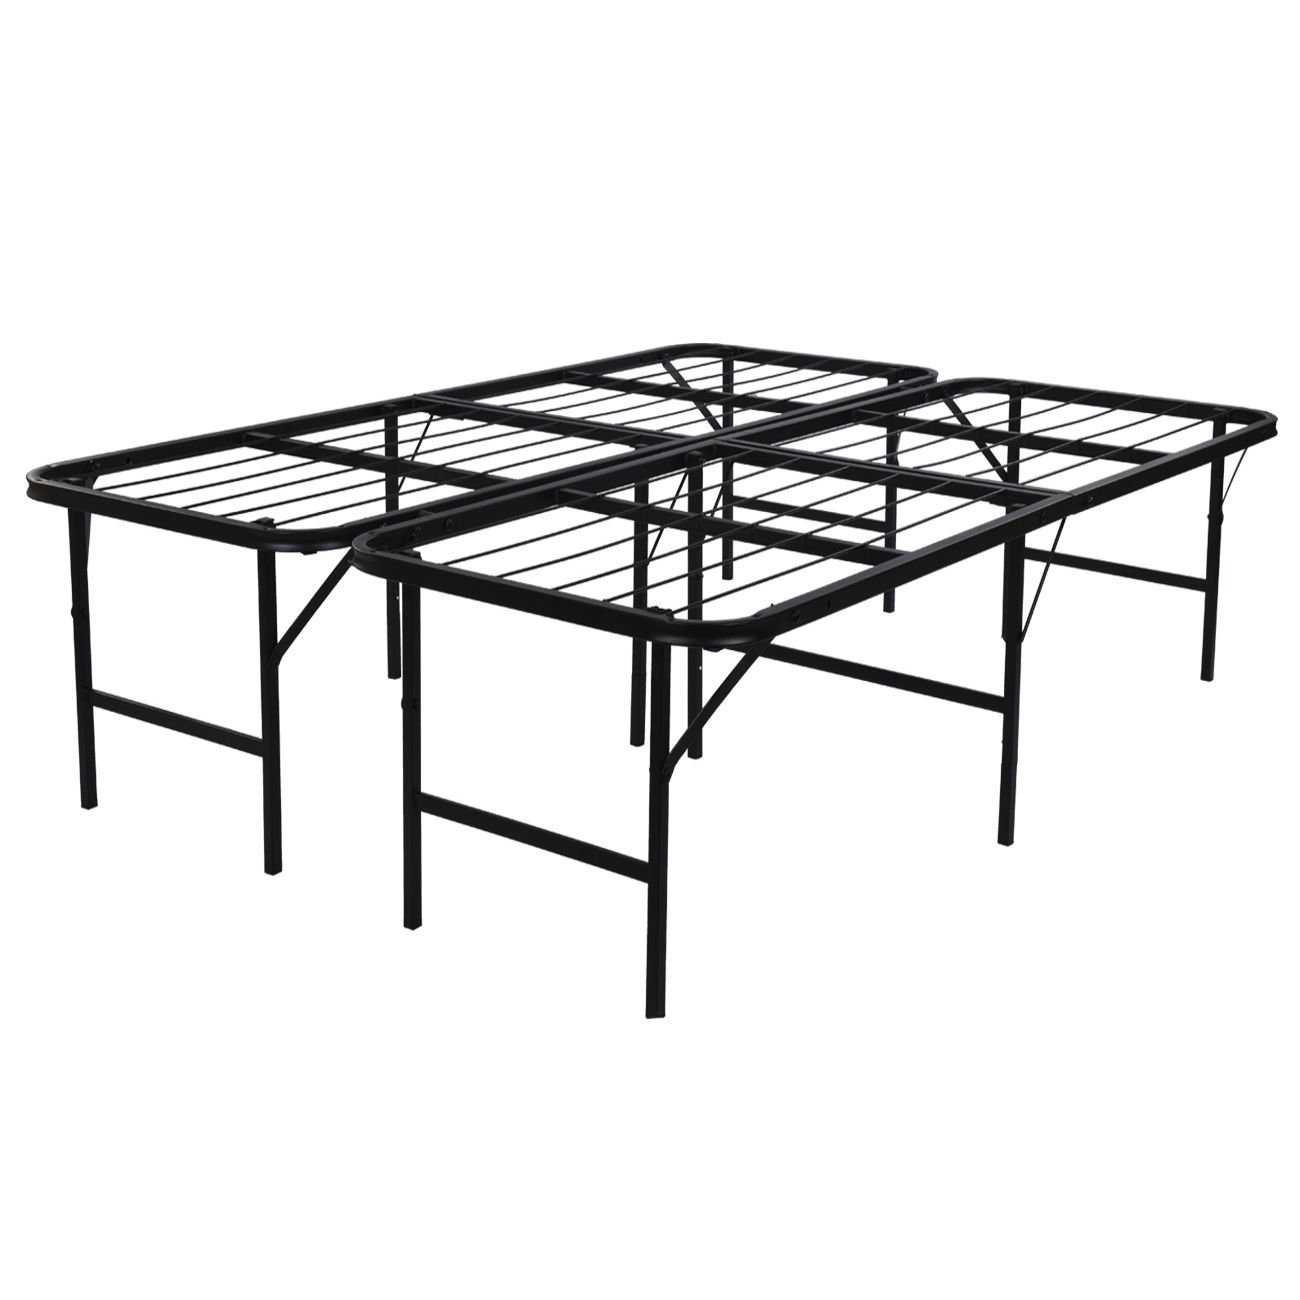 "Platform Bed Frame Steel Heavy Duty Queen Size Foldable Bedroom Storage - 17"""